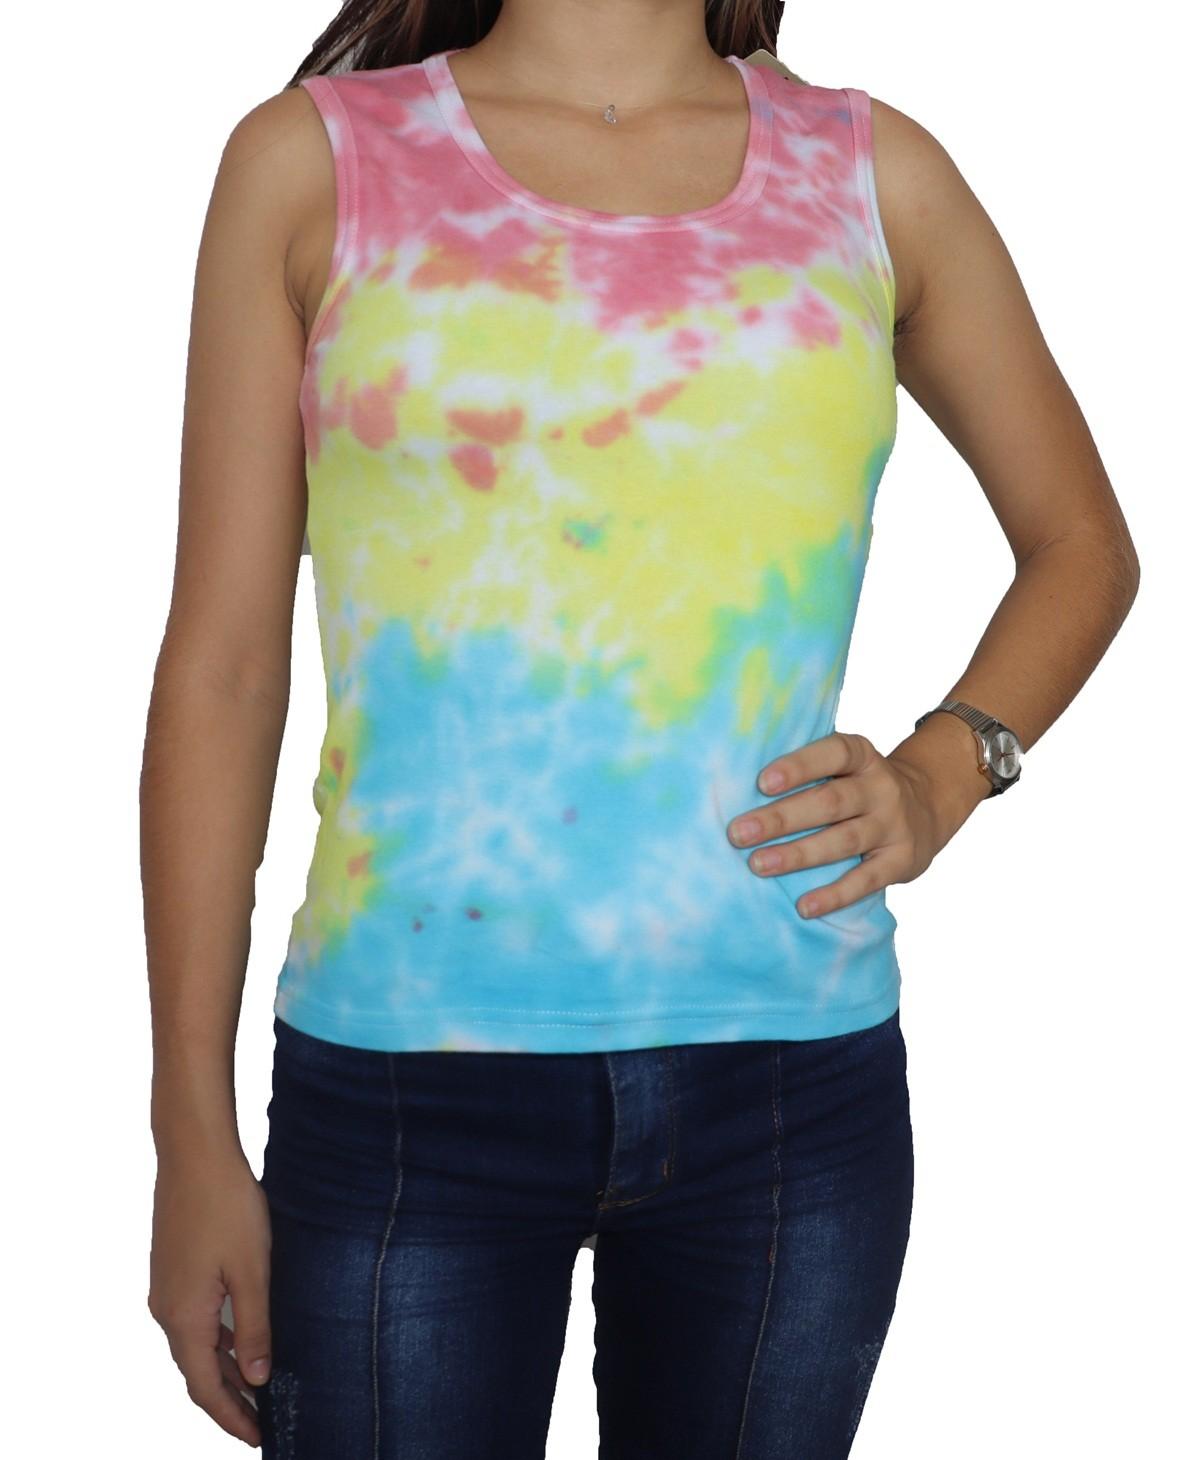 Regata Camiseta Feminina Tie Dye Evangélica  - HF | High Flight